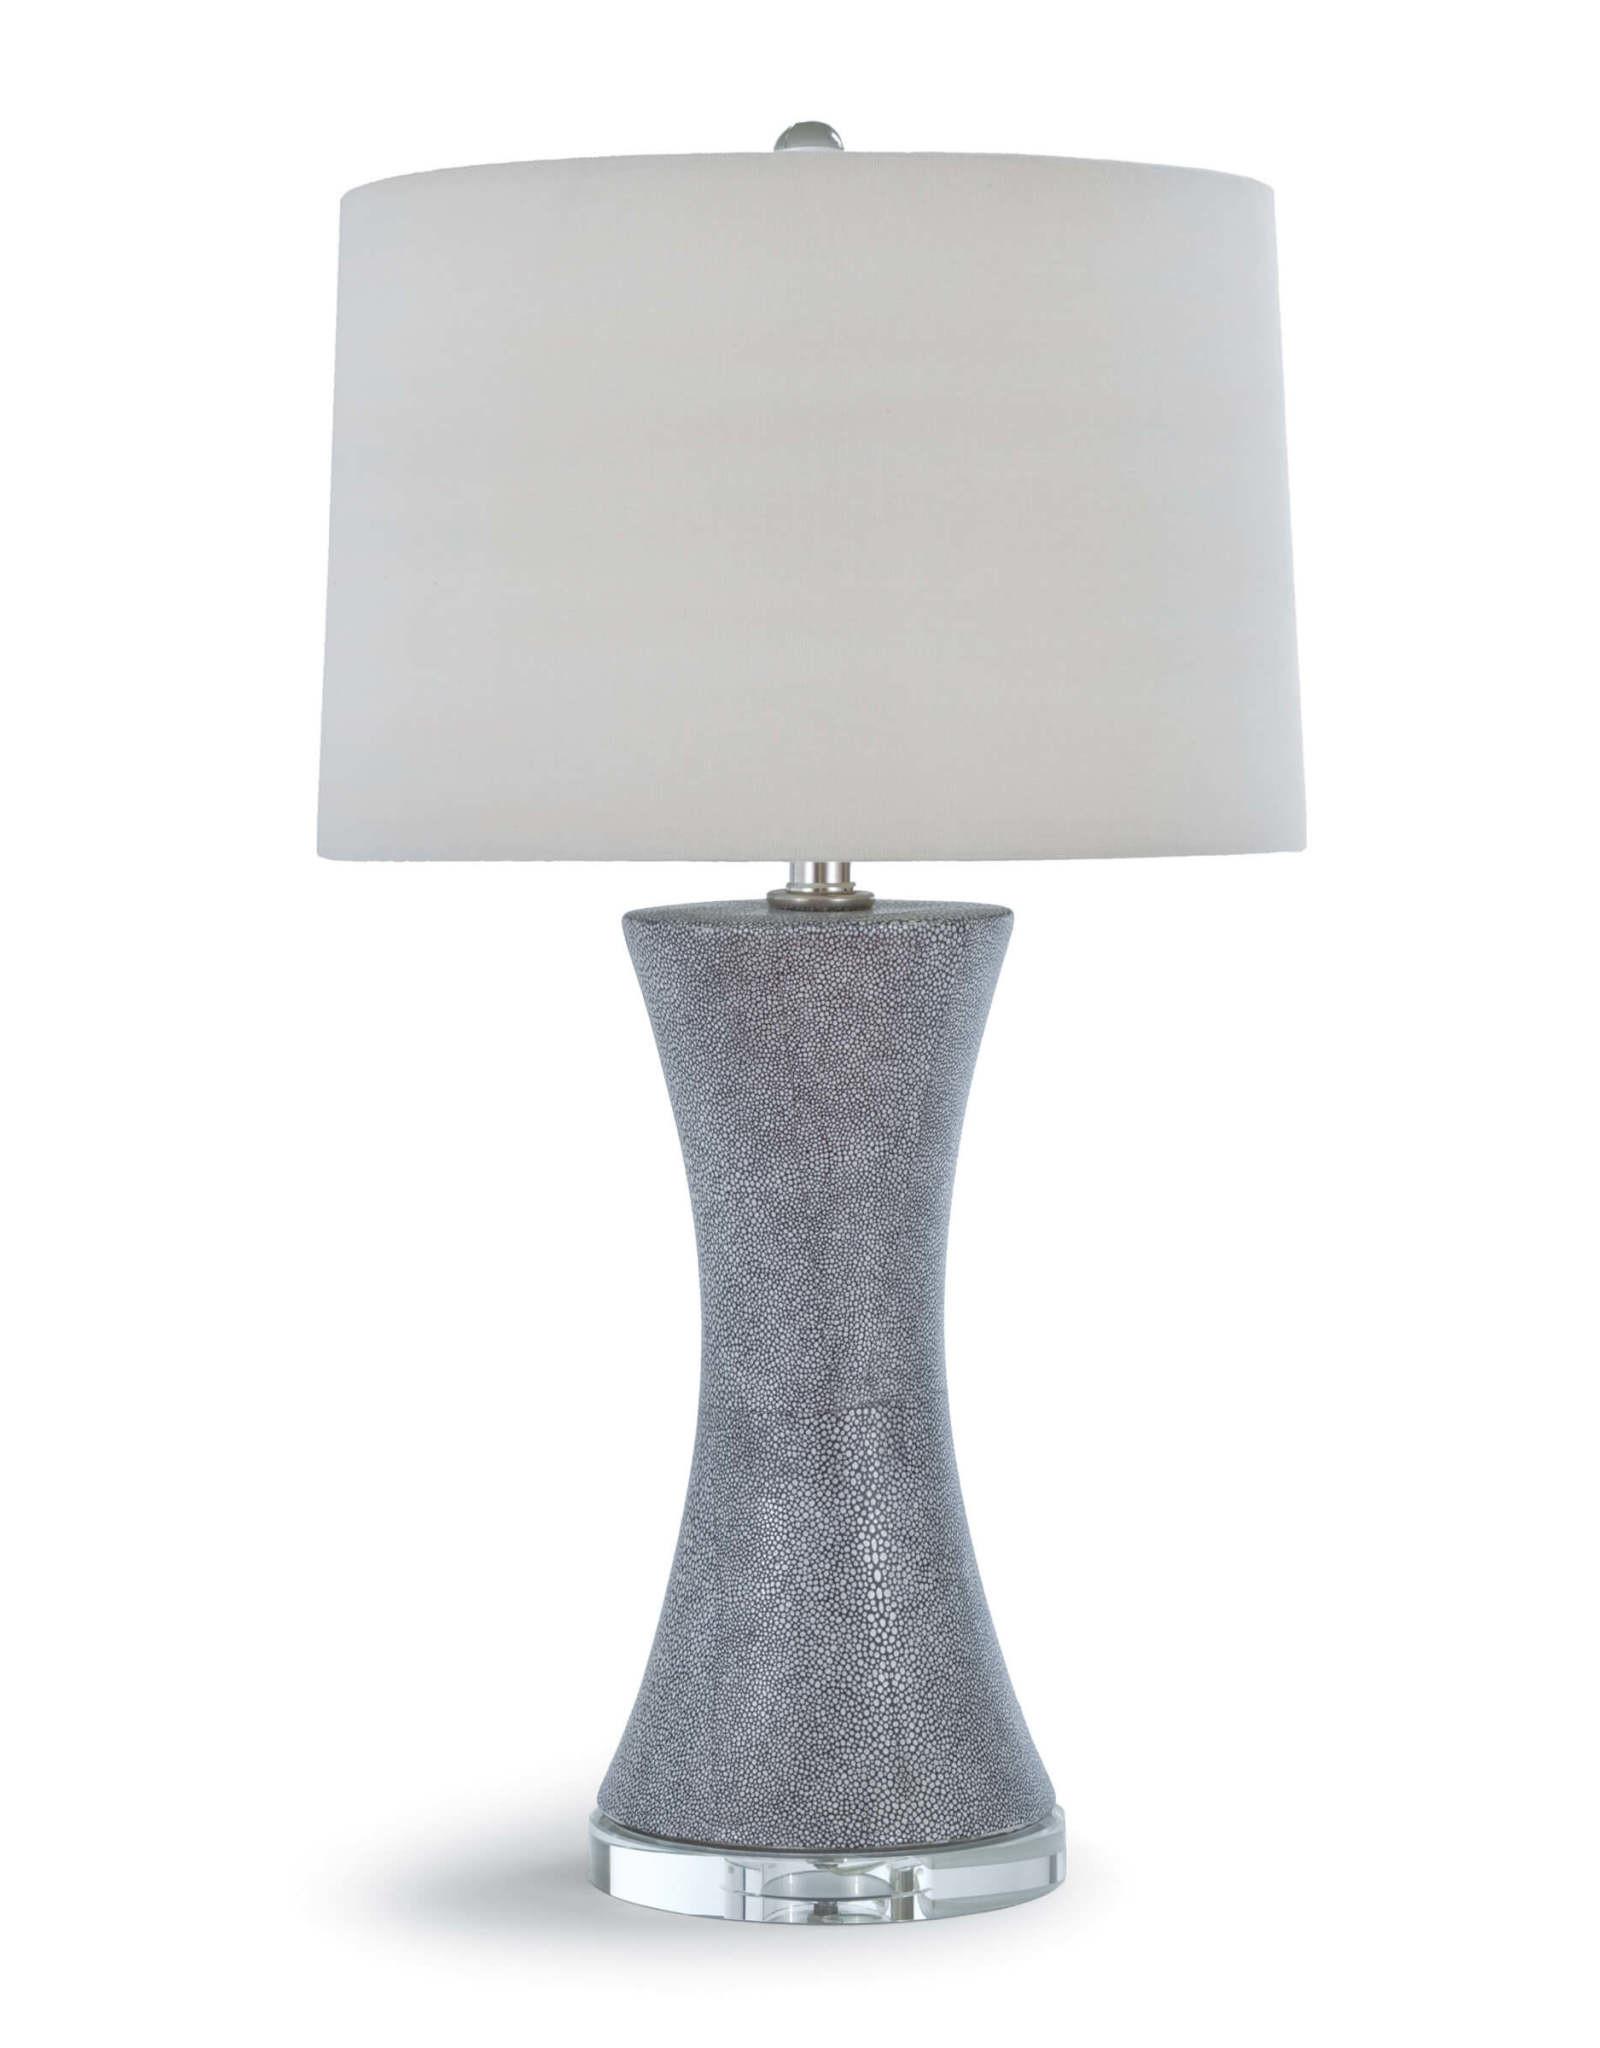 Regina Andrew Design Clara Charcoal Ceramic Shagreen Table Lamp